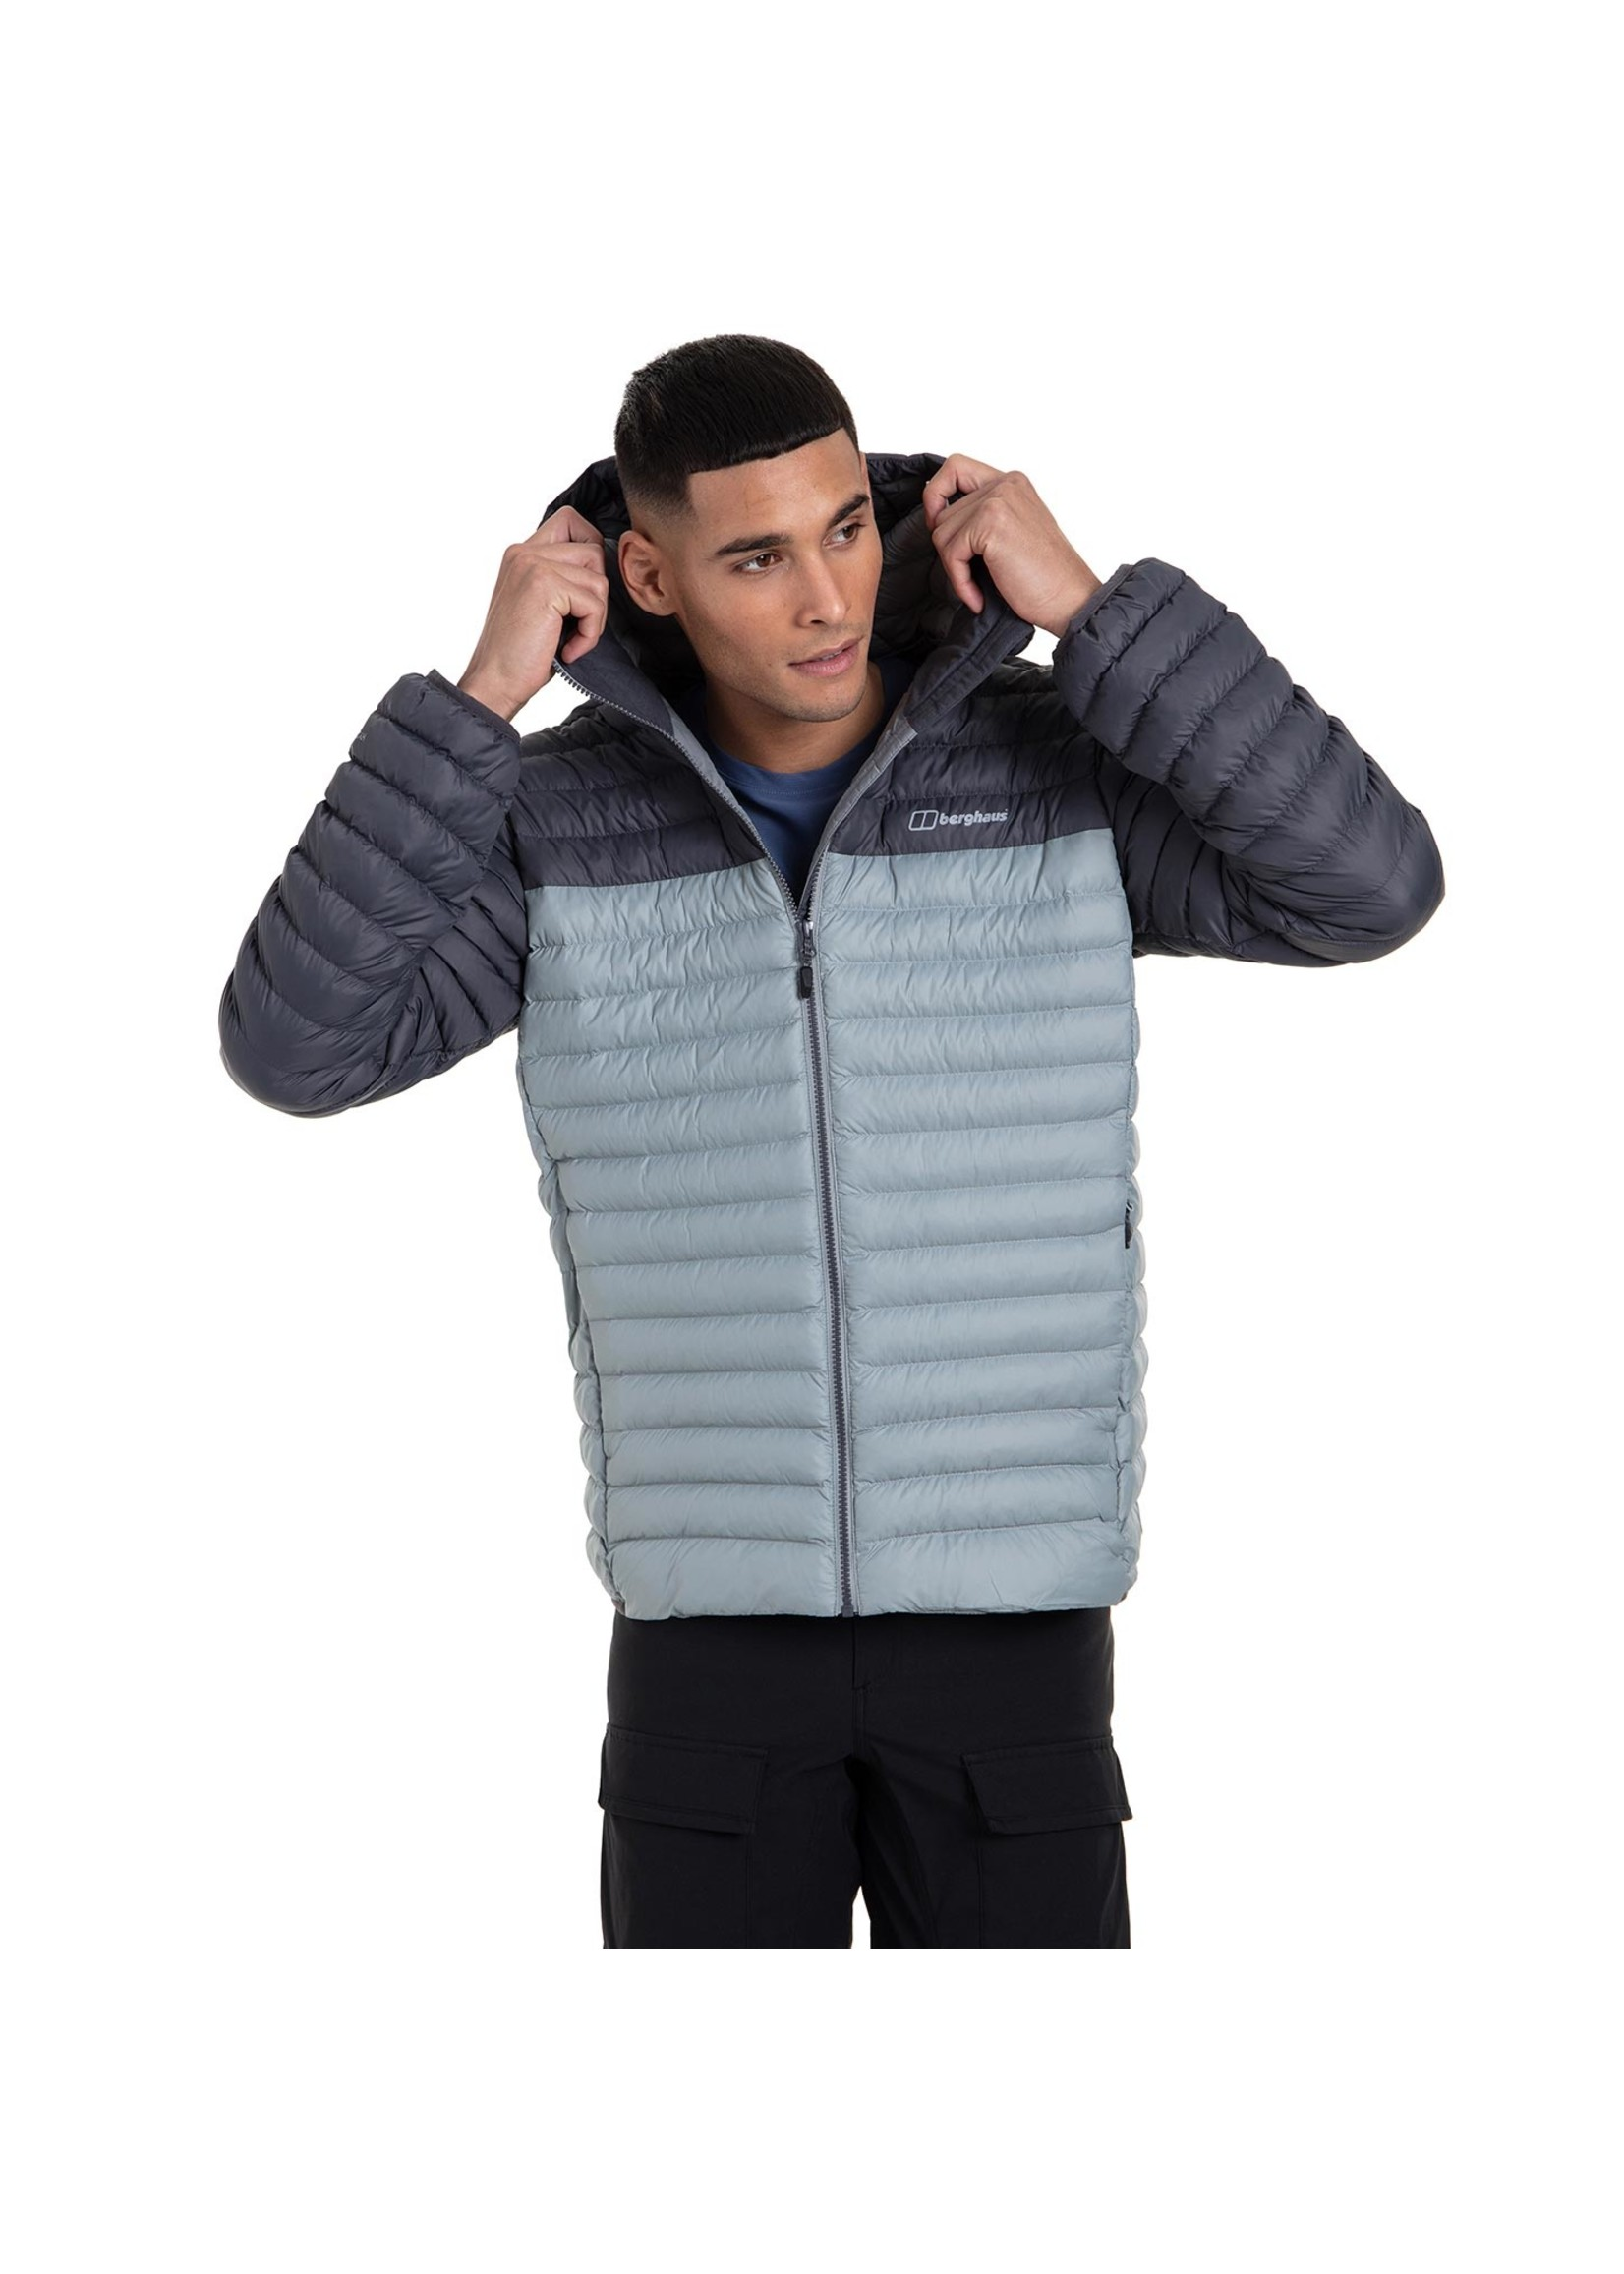 Berghaus Berghaus Vaskye Mens Synthetic Insulated Jacket, Grey/Grey